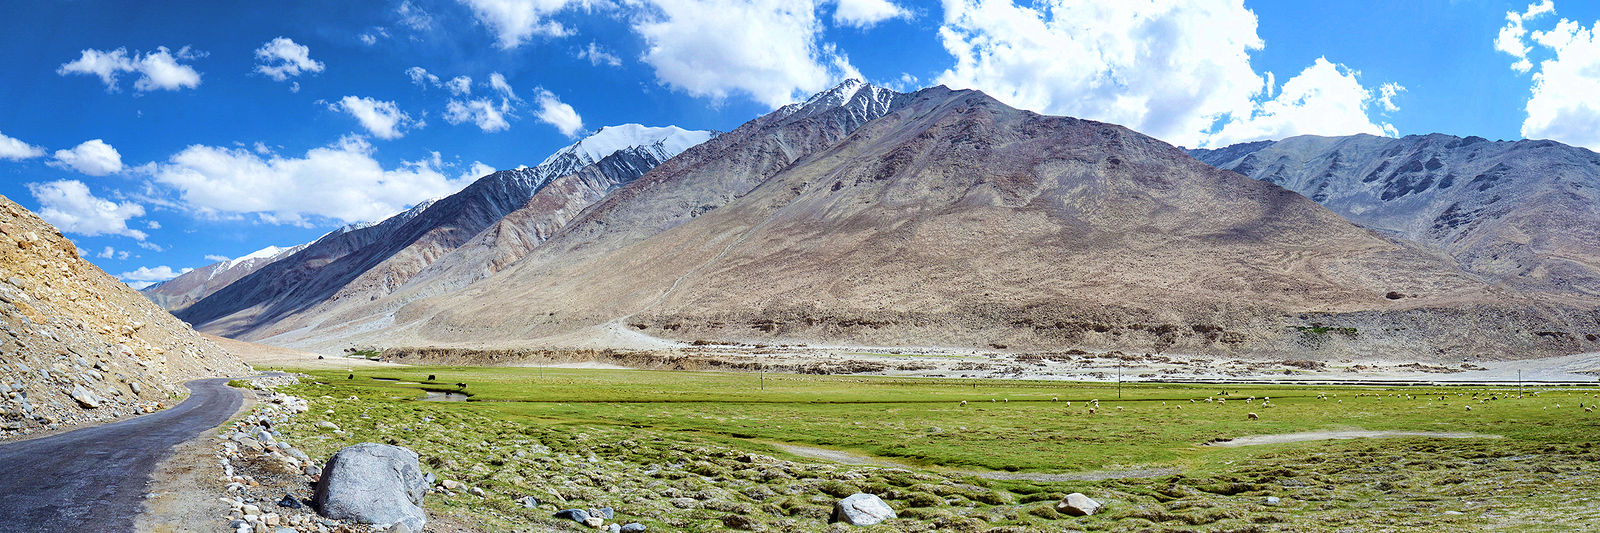 Ivan Aleshin. NH21 and other Himalayan Roads. 0013